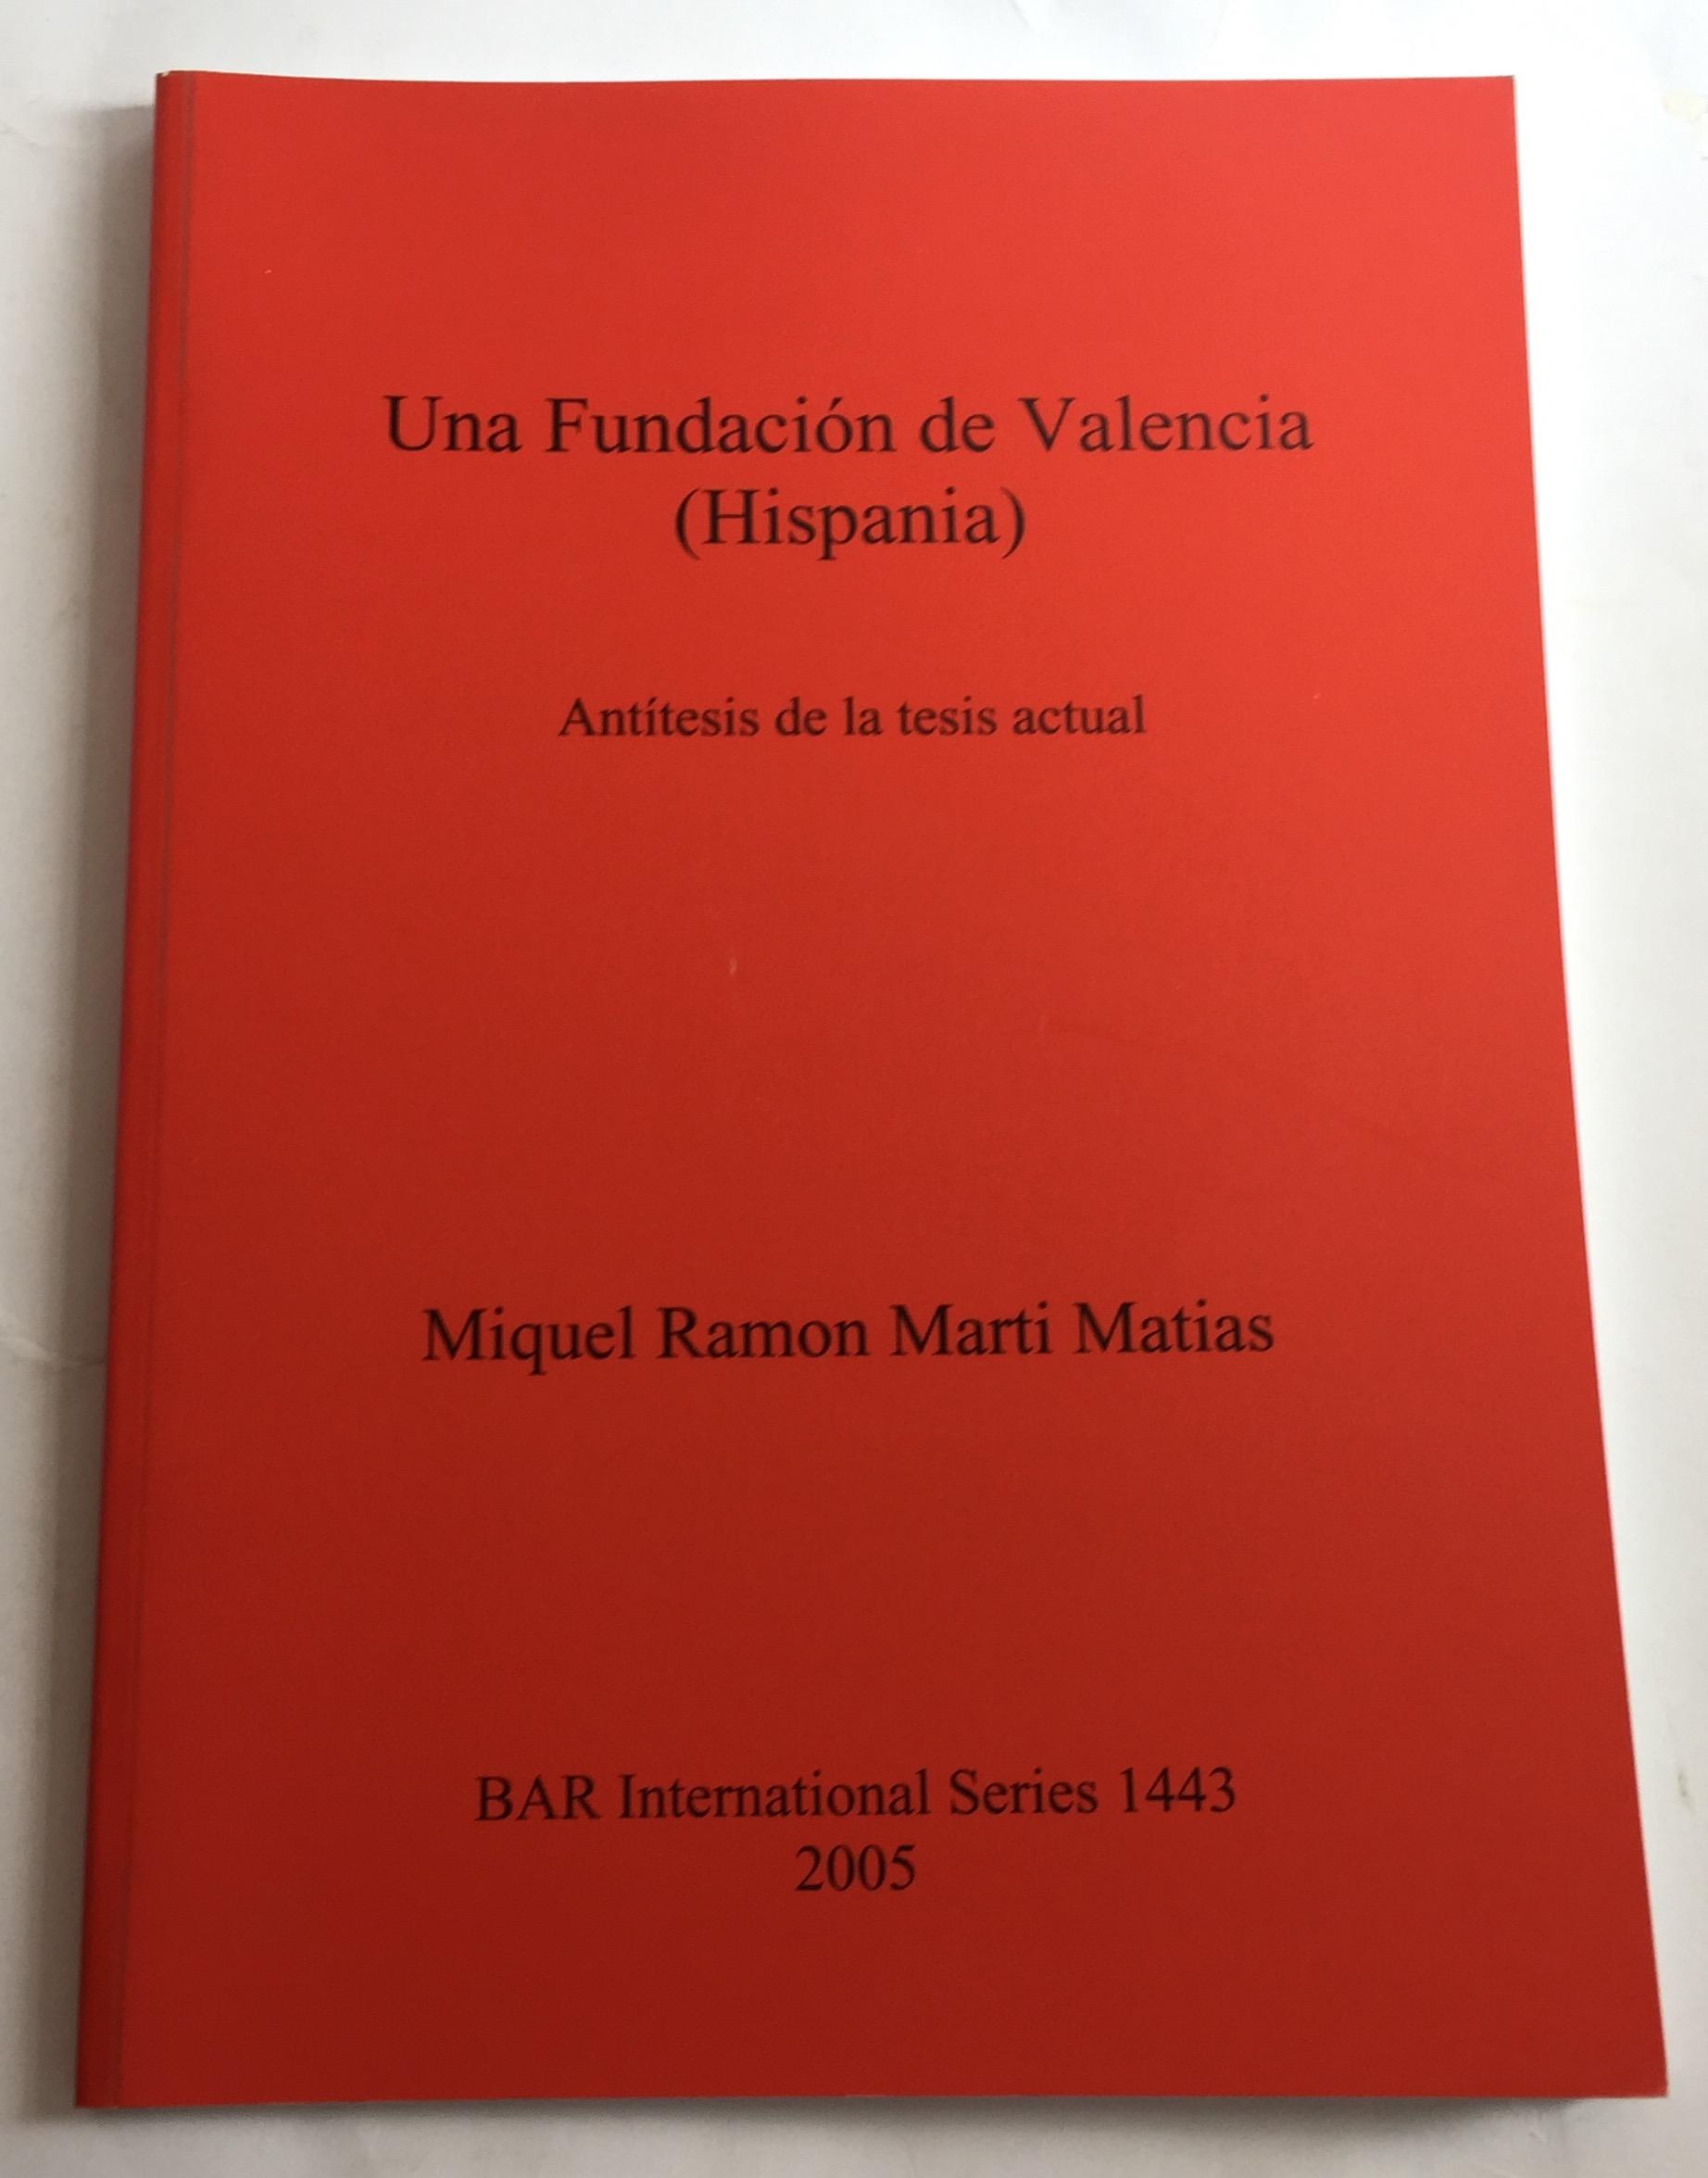 Una Fundacion de Valencia (Hispania) :Antitesis de la tesis actual (BAR International Series 1443), Matias, Miquel R M ;